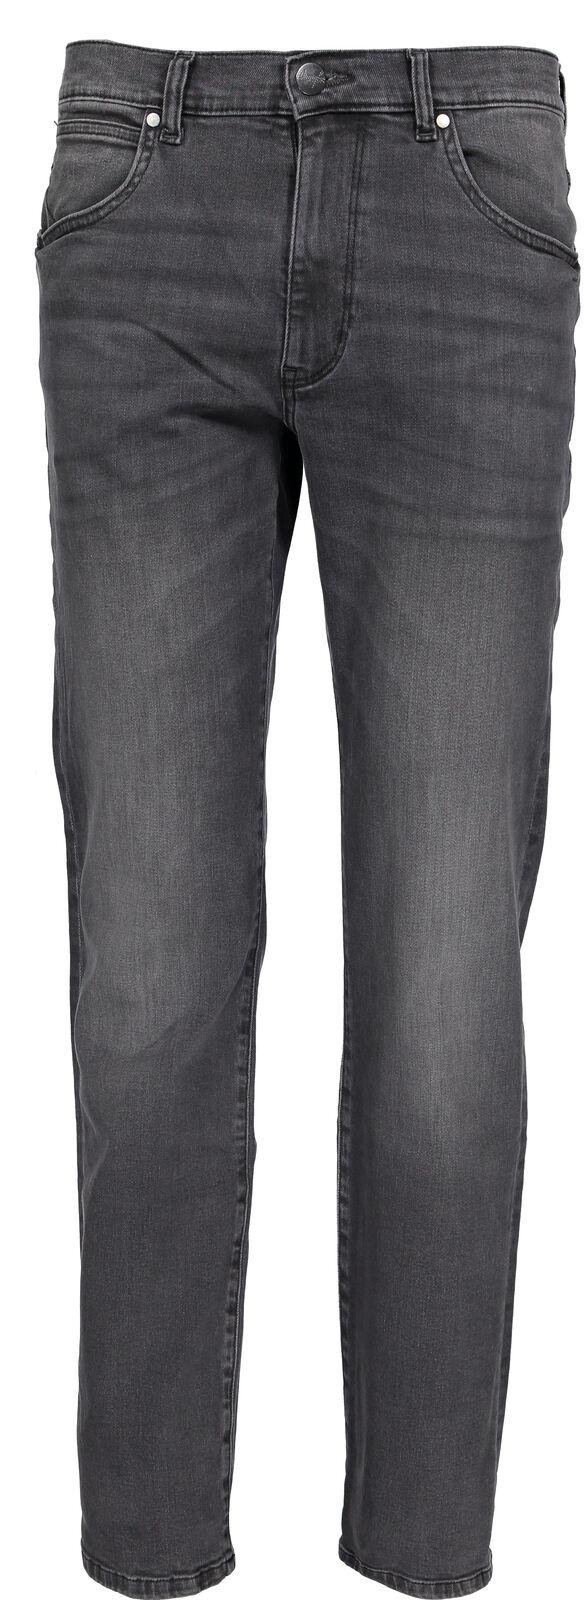 WRANGLER ARIZONA grau zone Regular Fit Fit Fit Jeans W12OEV247 678ea1